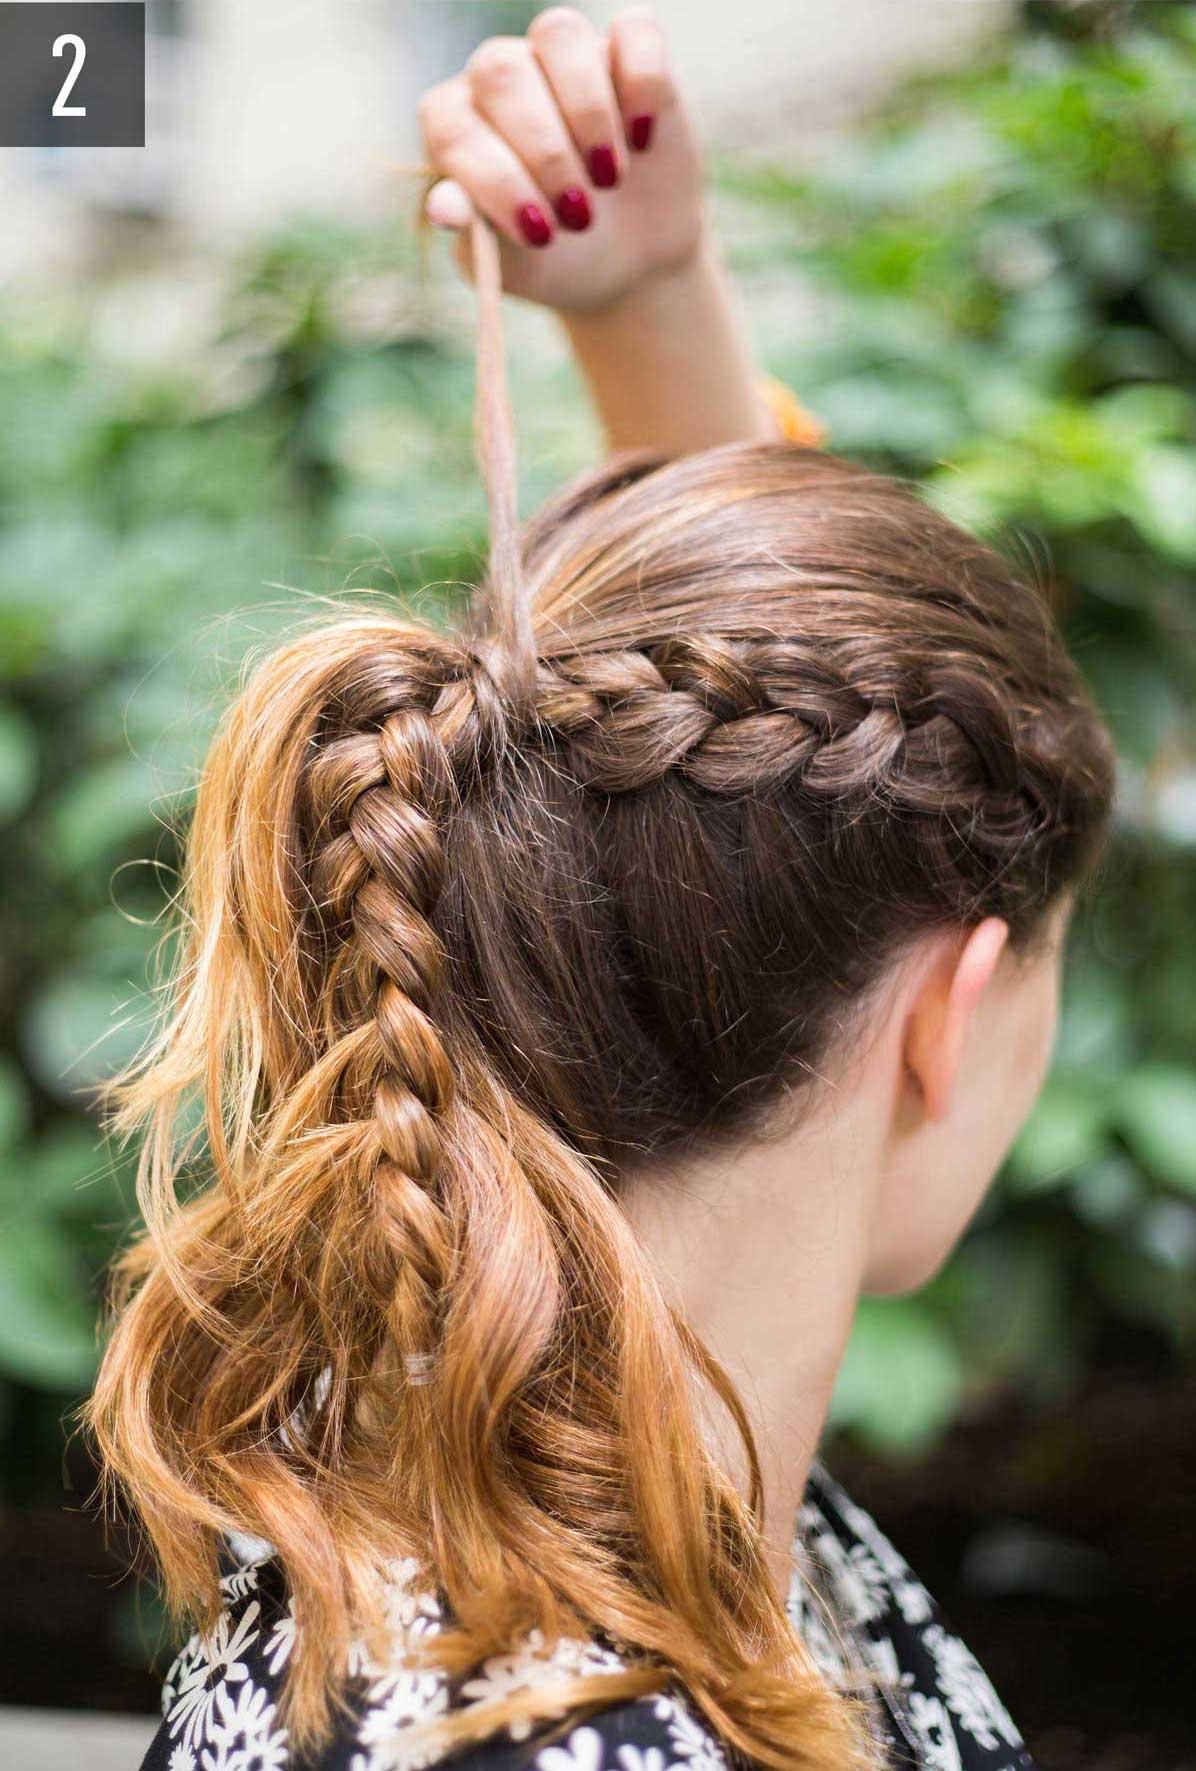 bestie-braid hair 9